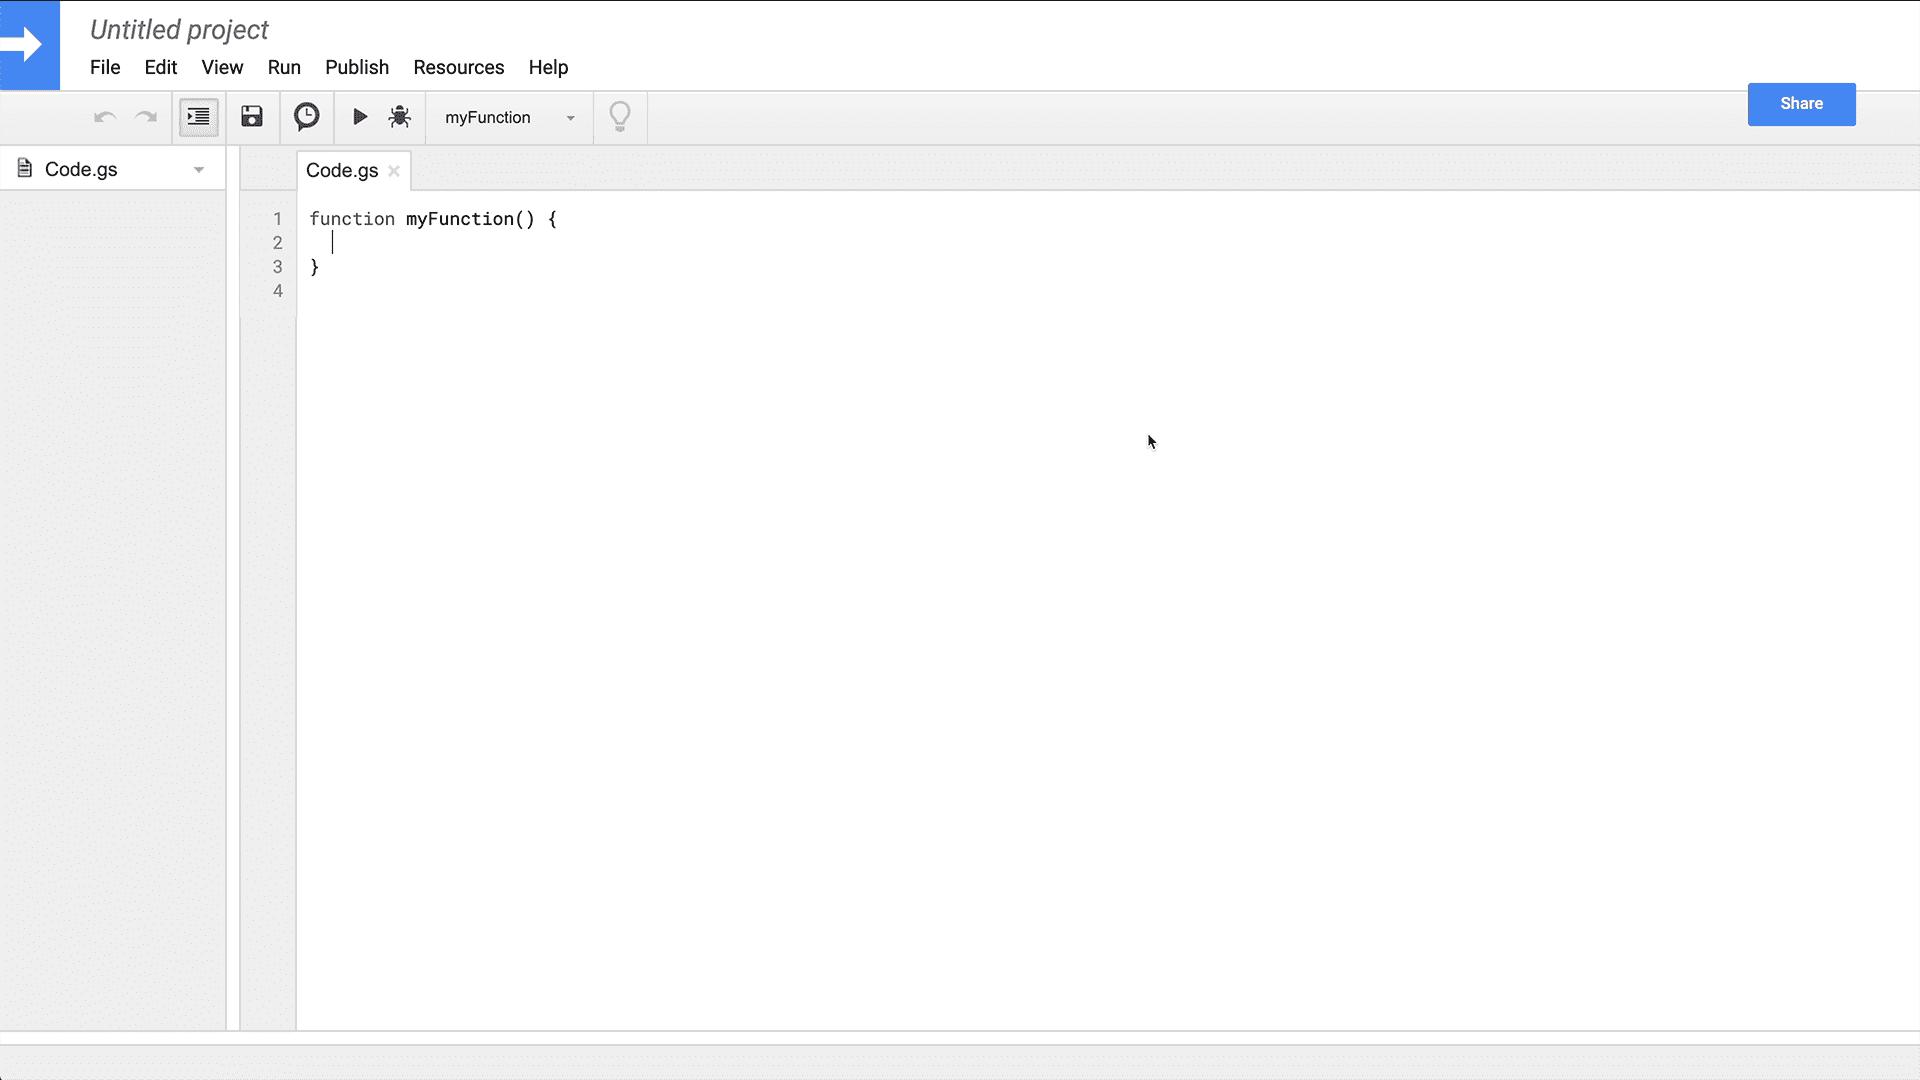 google-apps-script-new-project.png